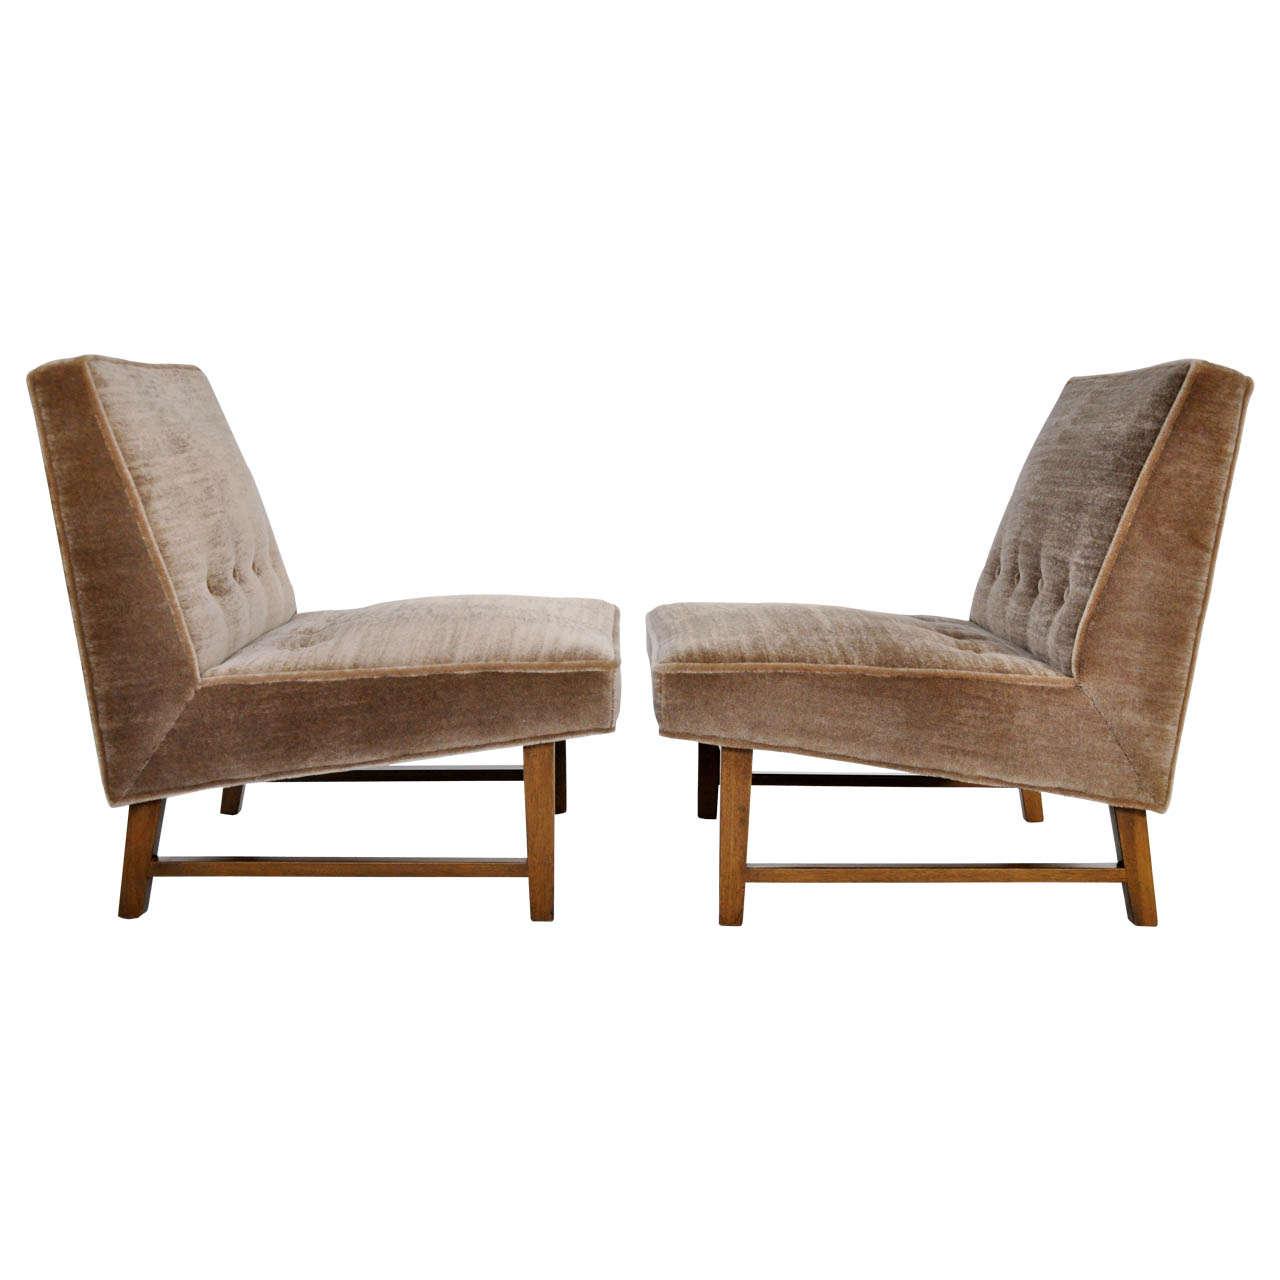 Dunbar slipper chairs edward wormley at 1stdibs - Edward wormley chairs ...